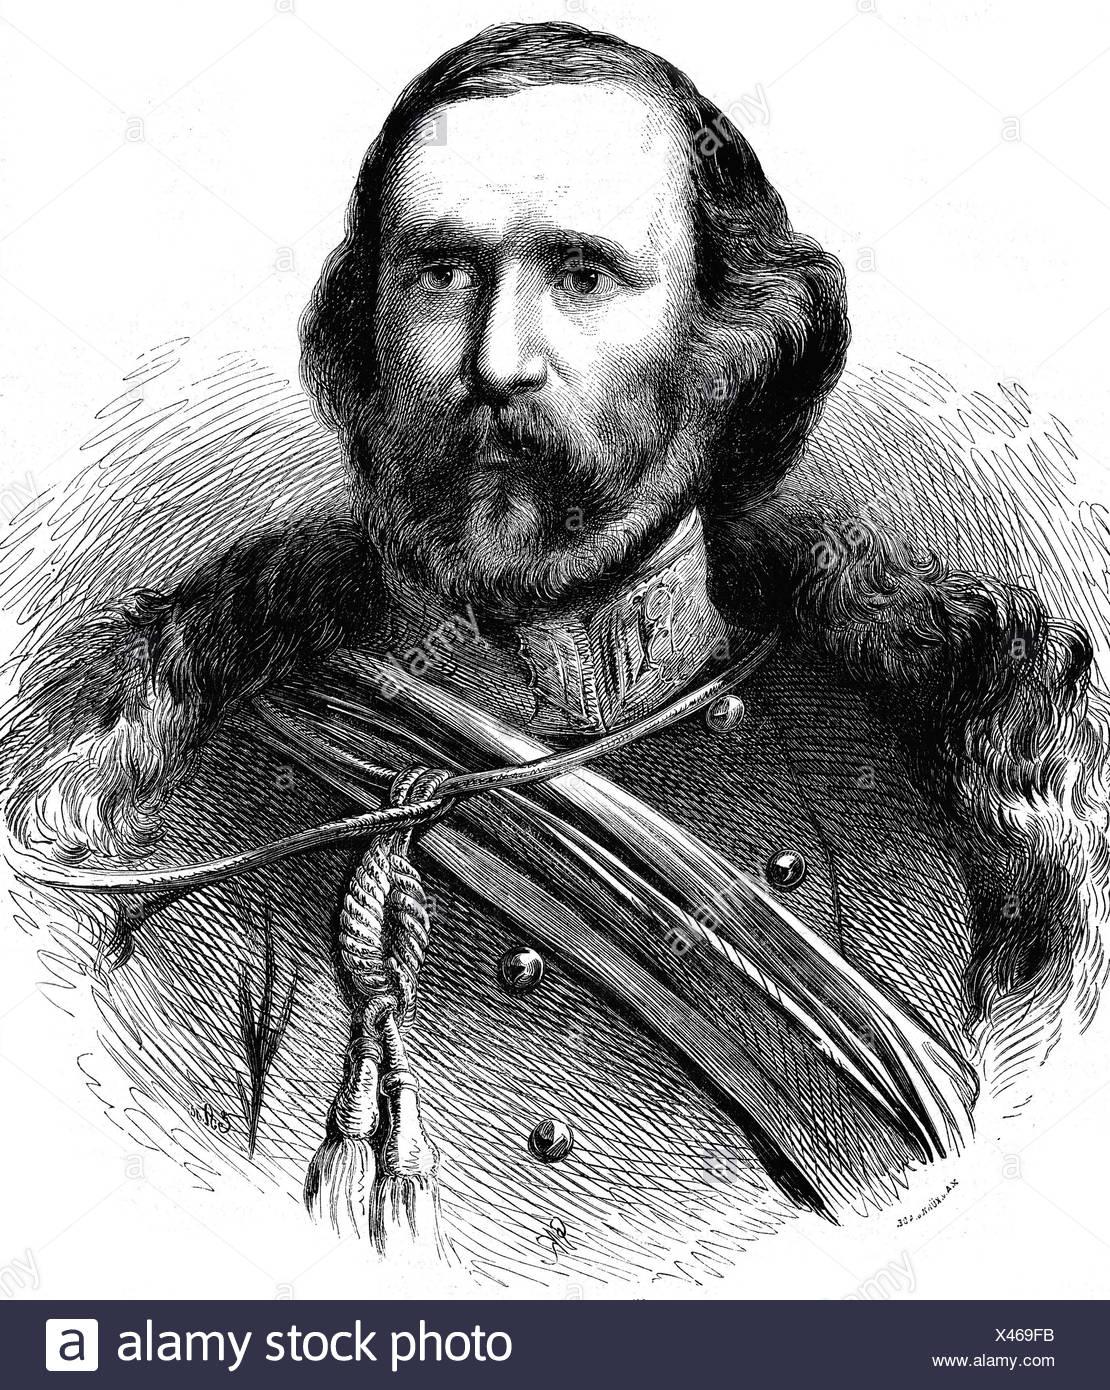 Garibaldi, Giuseppe, 4.7.1807 - 2.6.1882, Italian revolutionary, portrait, engraving, 1868, freedom fighter, patriot, Risorgimento, politics, uniform, , Additional-Rights-Clearances-NA - Stock Image